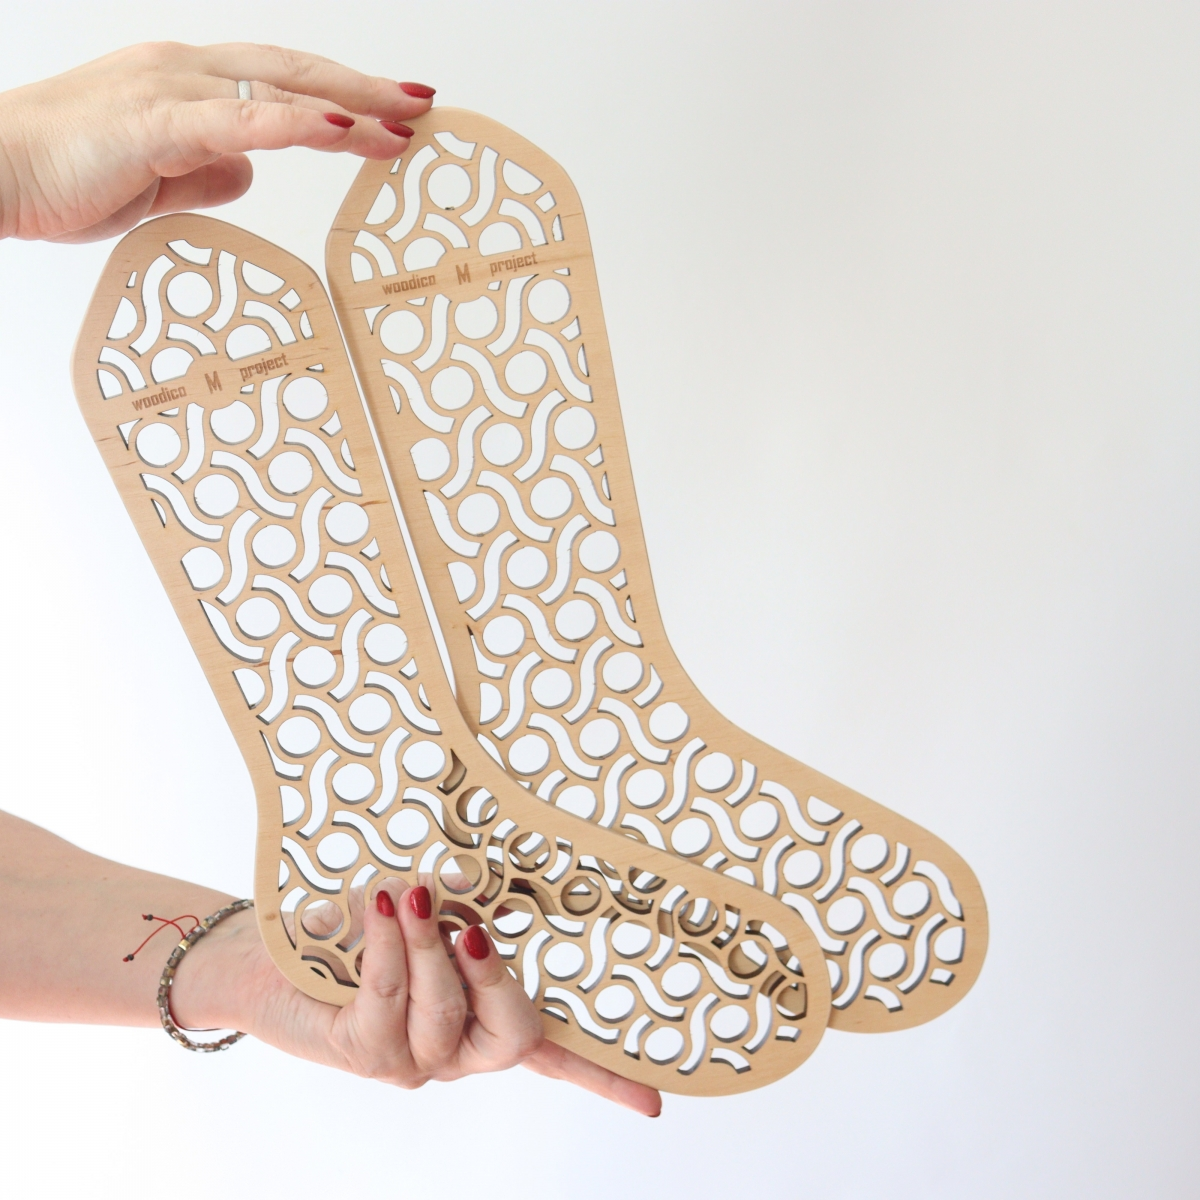 woodico.pro wooden sock blockers pasta 9 1200x1200 - Wooden sock blockers / Pasta